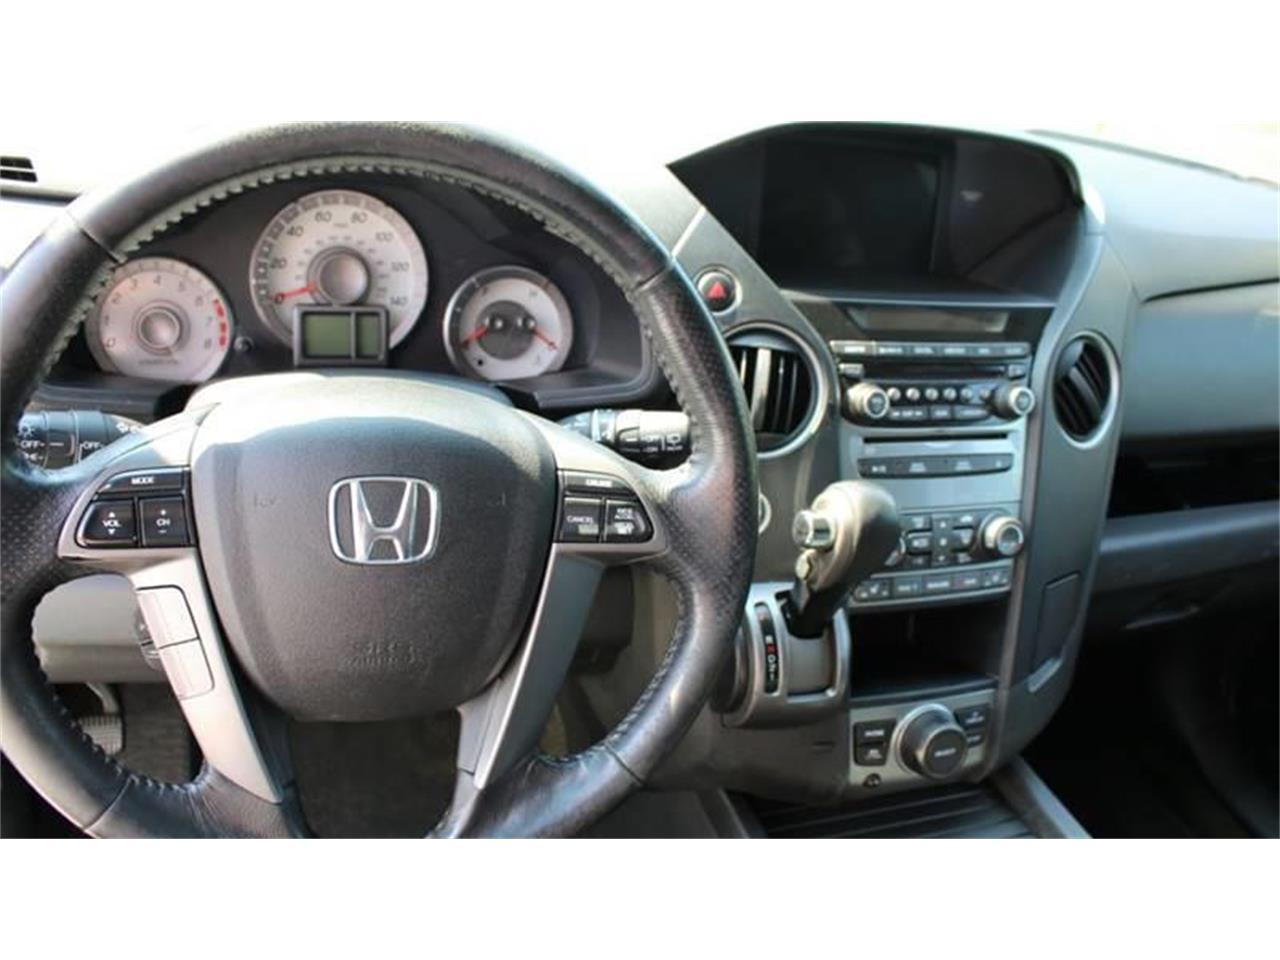 2014 Honda Pilot (CC-1419948) for sale in Hilton, New York